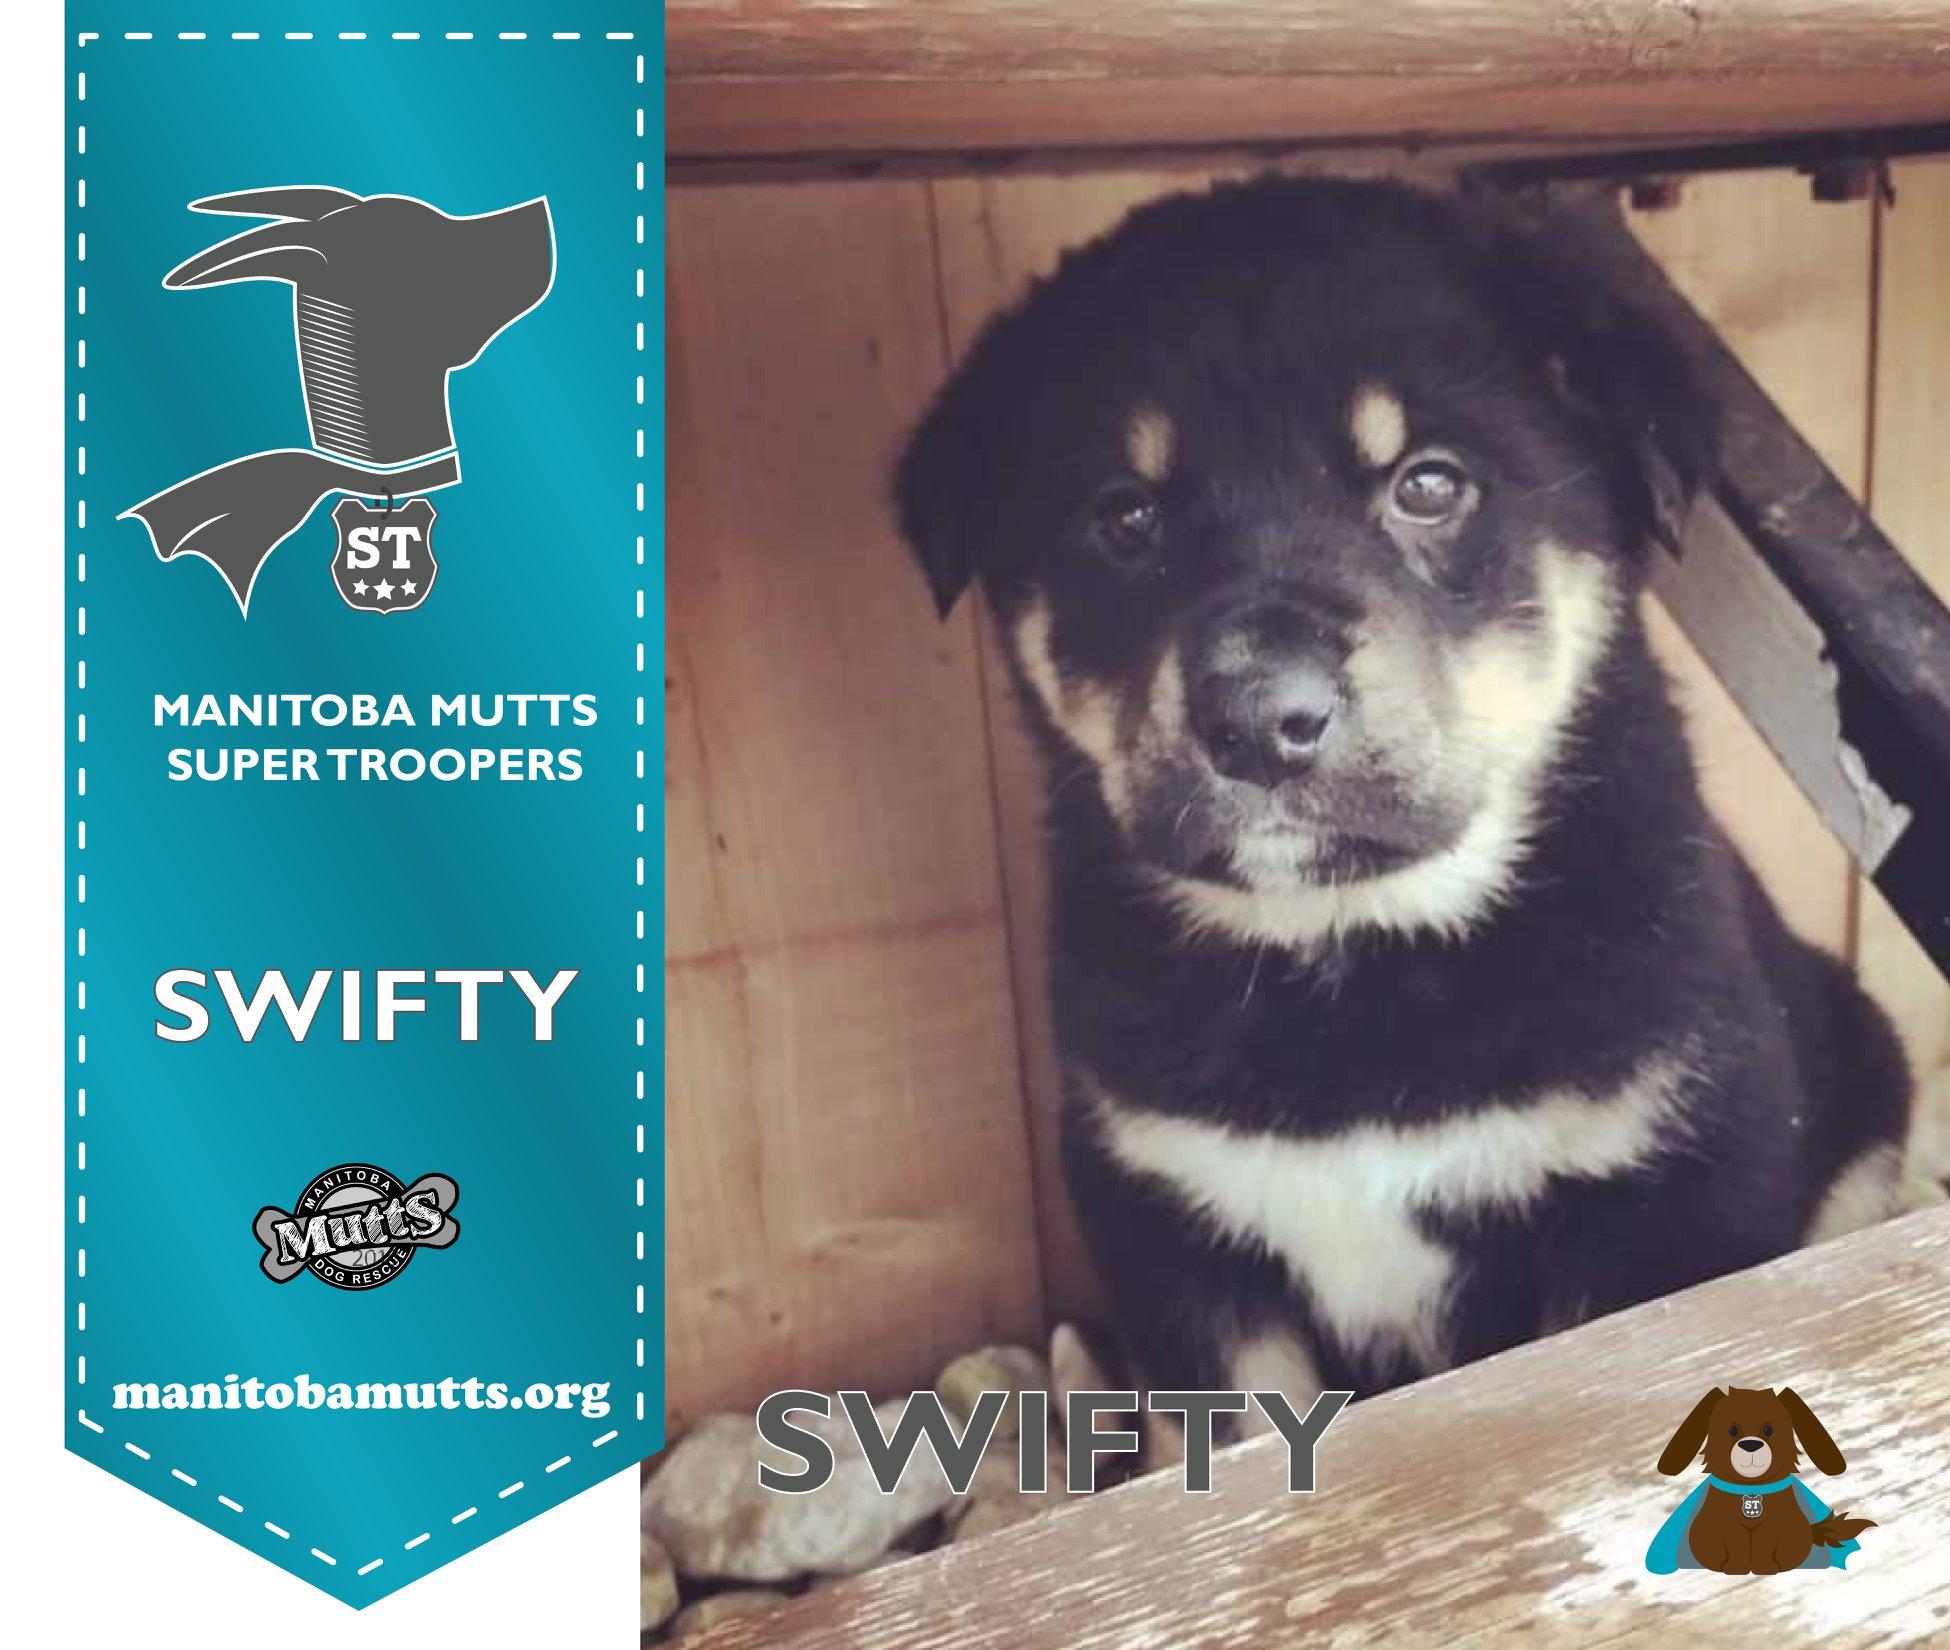 Swifty - Super Trooper